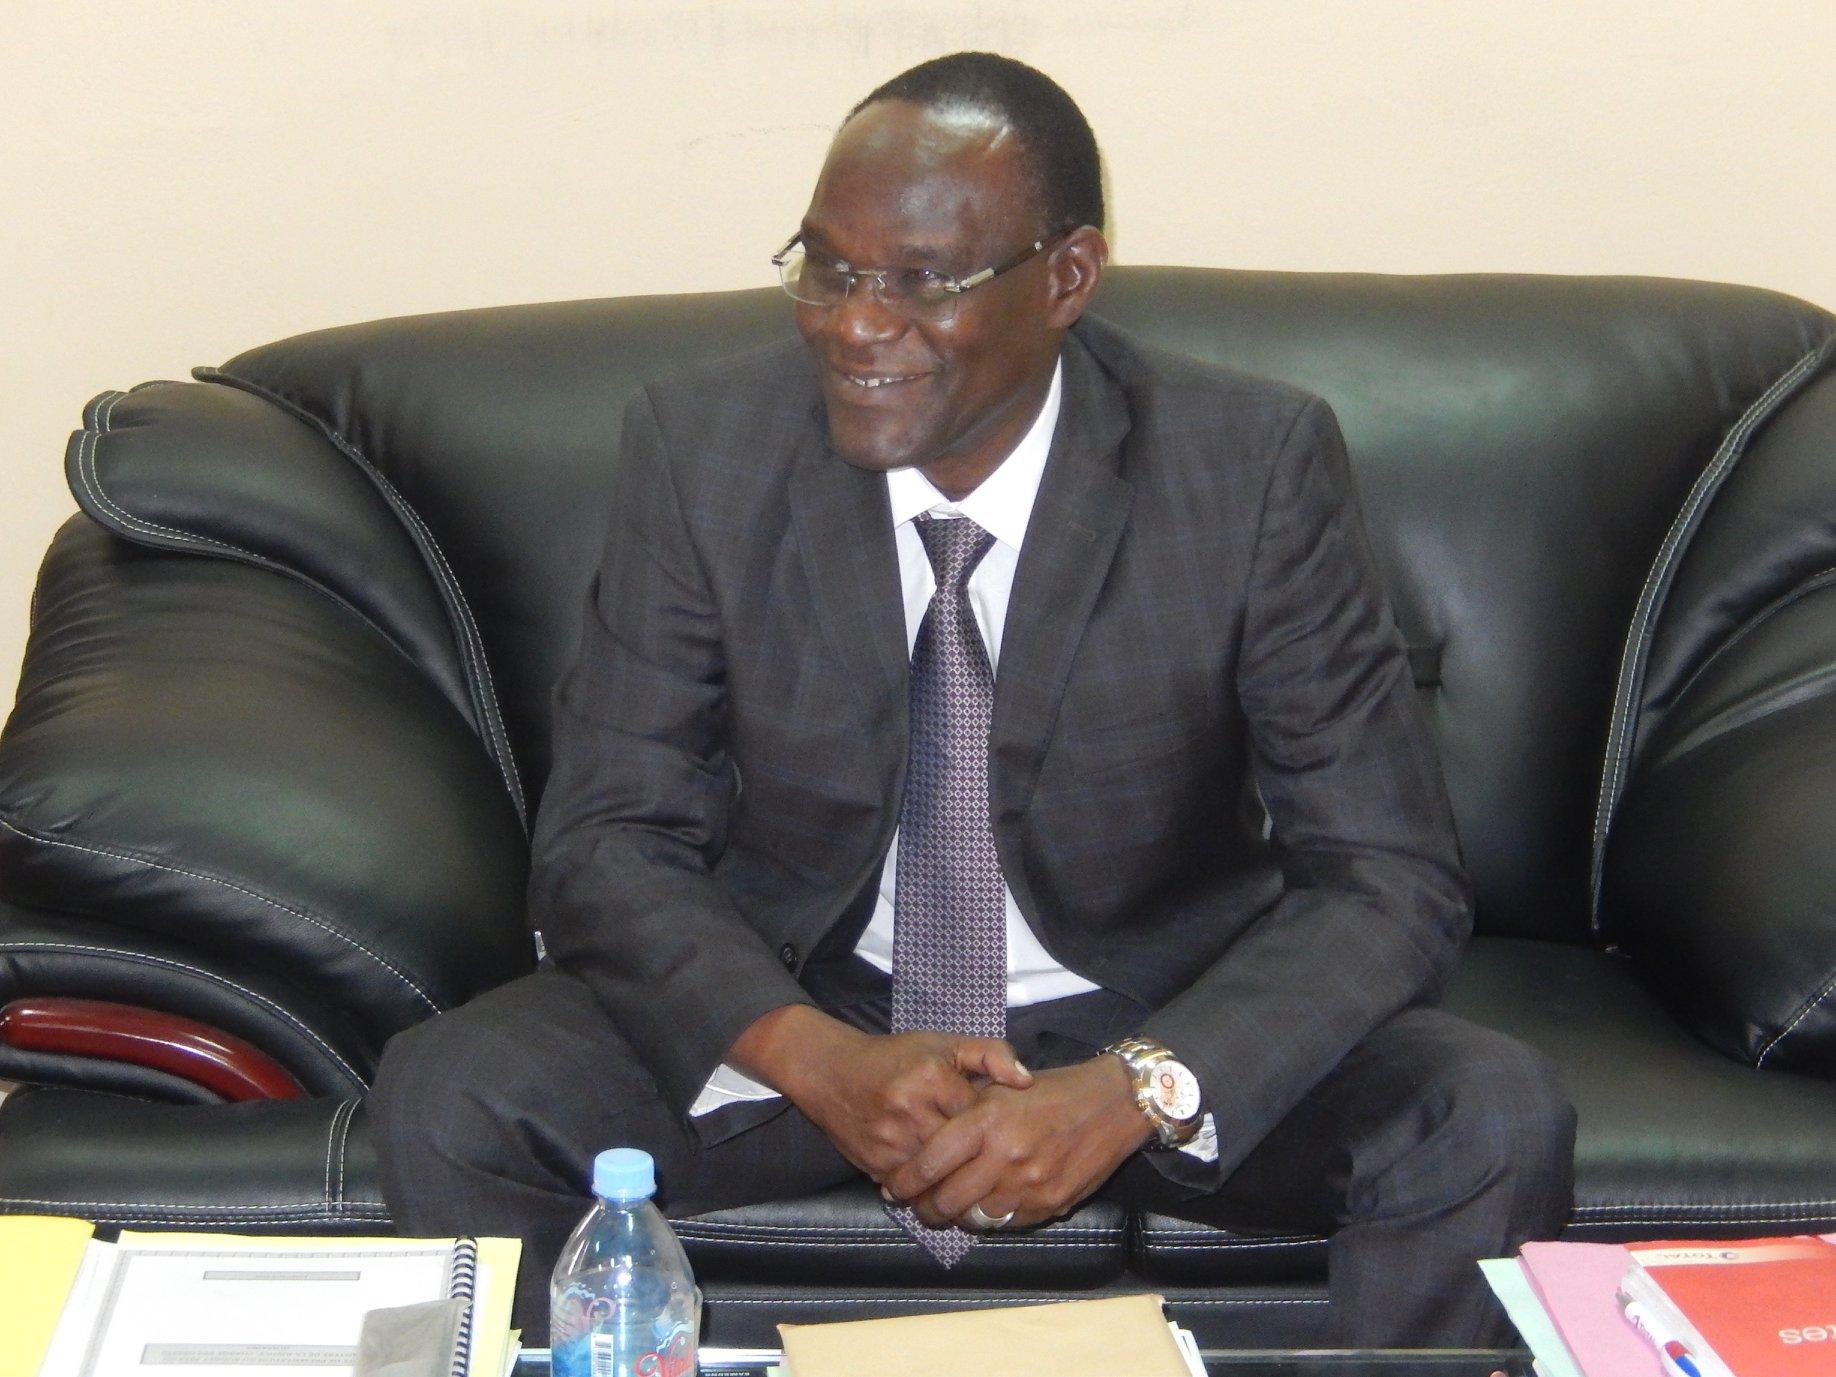 Le ministre de la Justice chargé des droits humains, Djimet Arabi. © Min.Justice